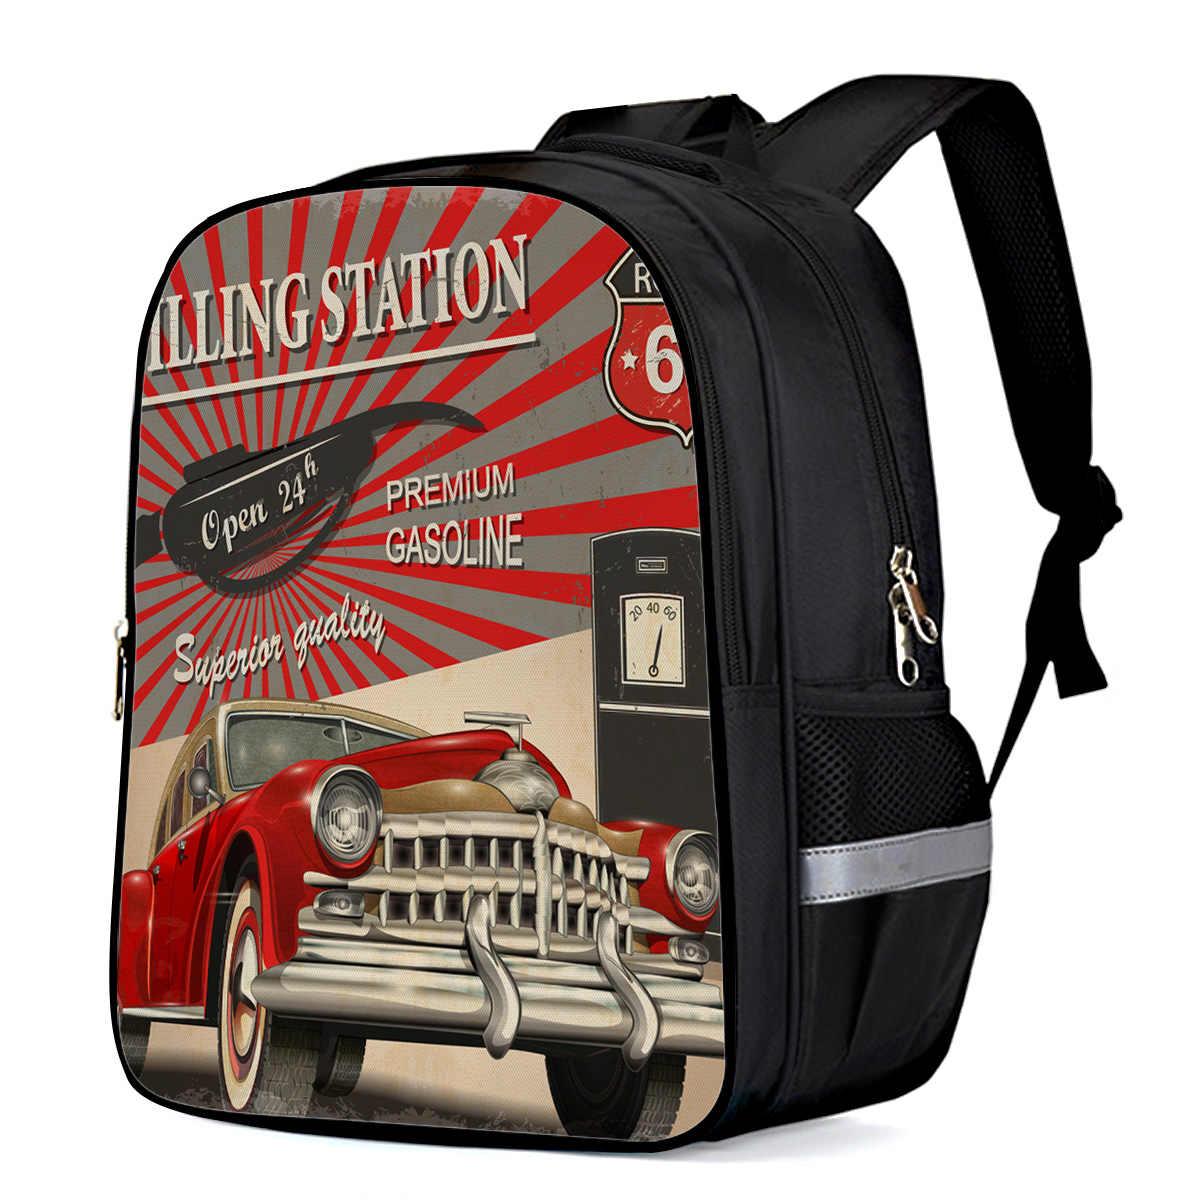 Ретро плакат с изображением автомобиля Route 66 многоцелевой рюкзак спортивный рюкзак для ноутбука Рюкзаки спортивный рюкзак походные рюкзаки сумка на плечо